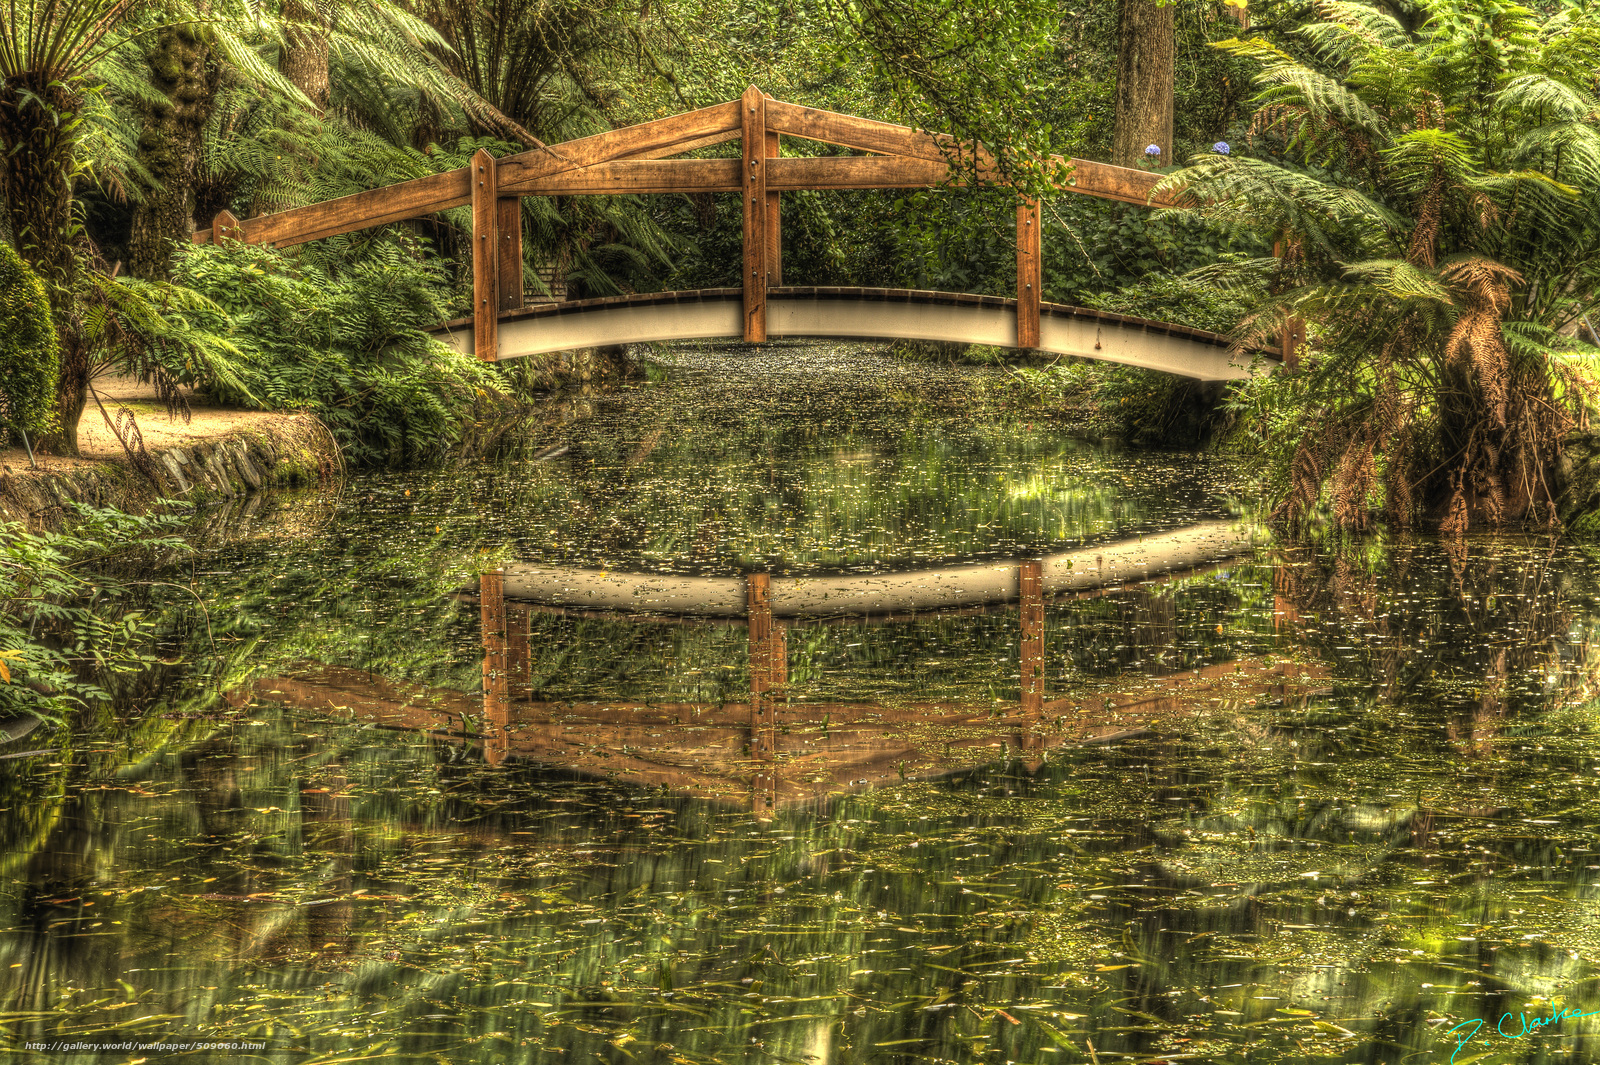 landscape wallpaperwooden bridgecabin - photo #9